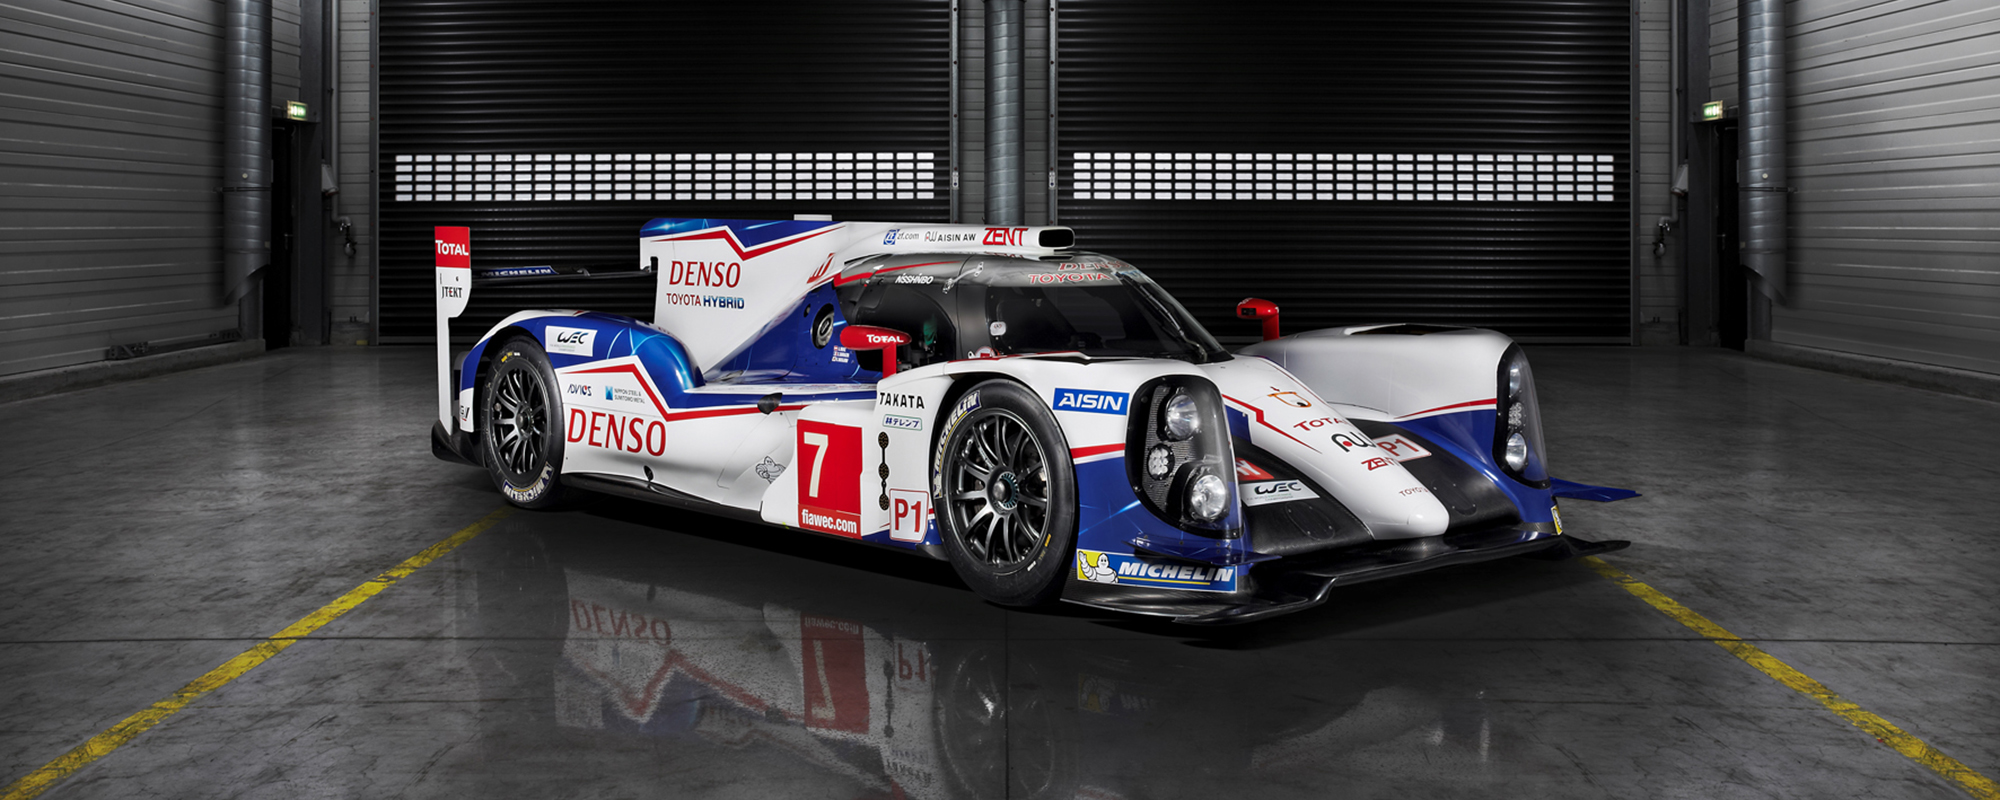 Toyota TS040 HYBRID op scherp voor FIA World Endurance Championship 2014